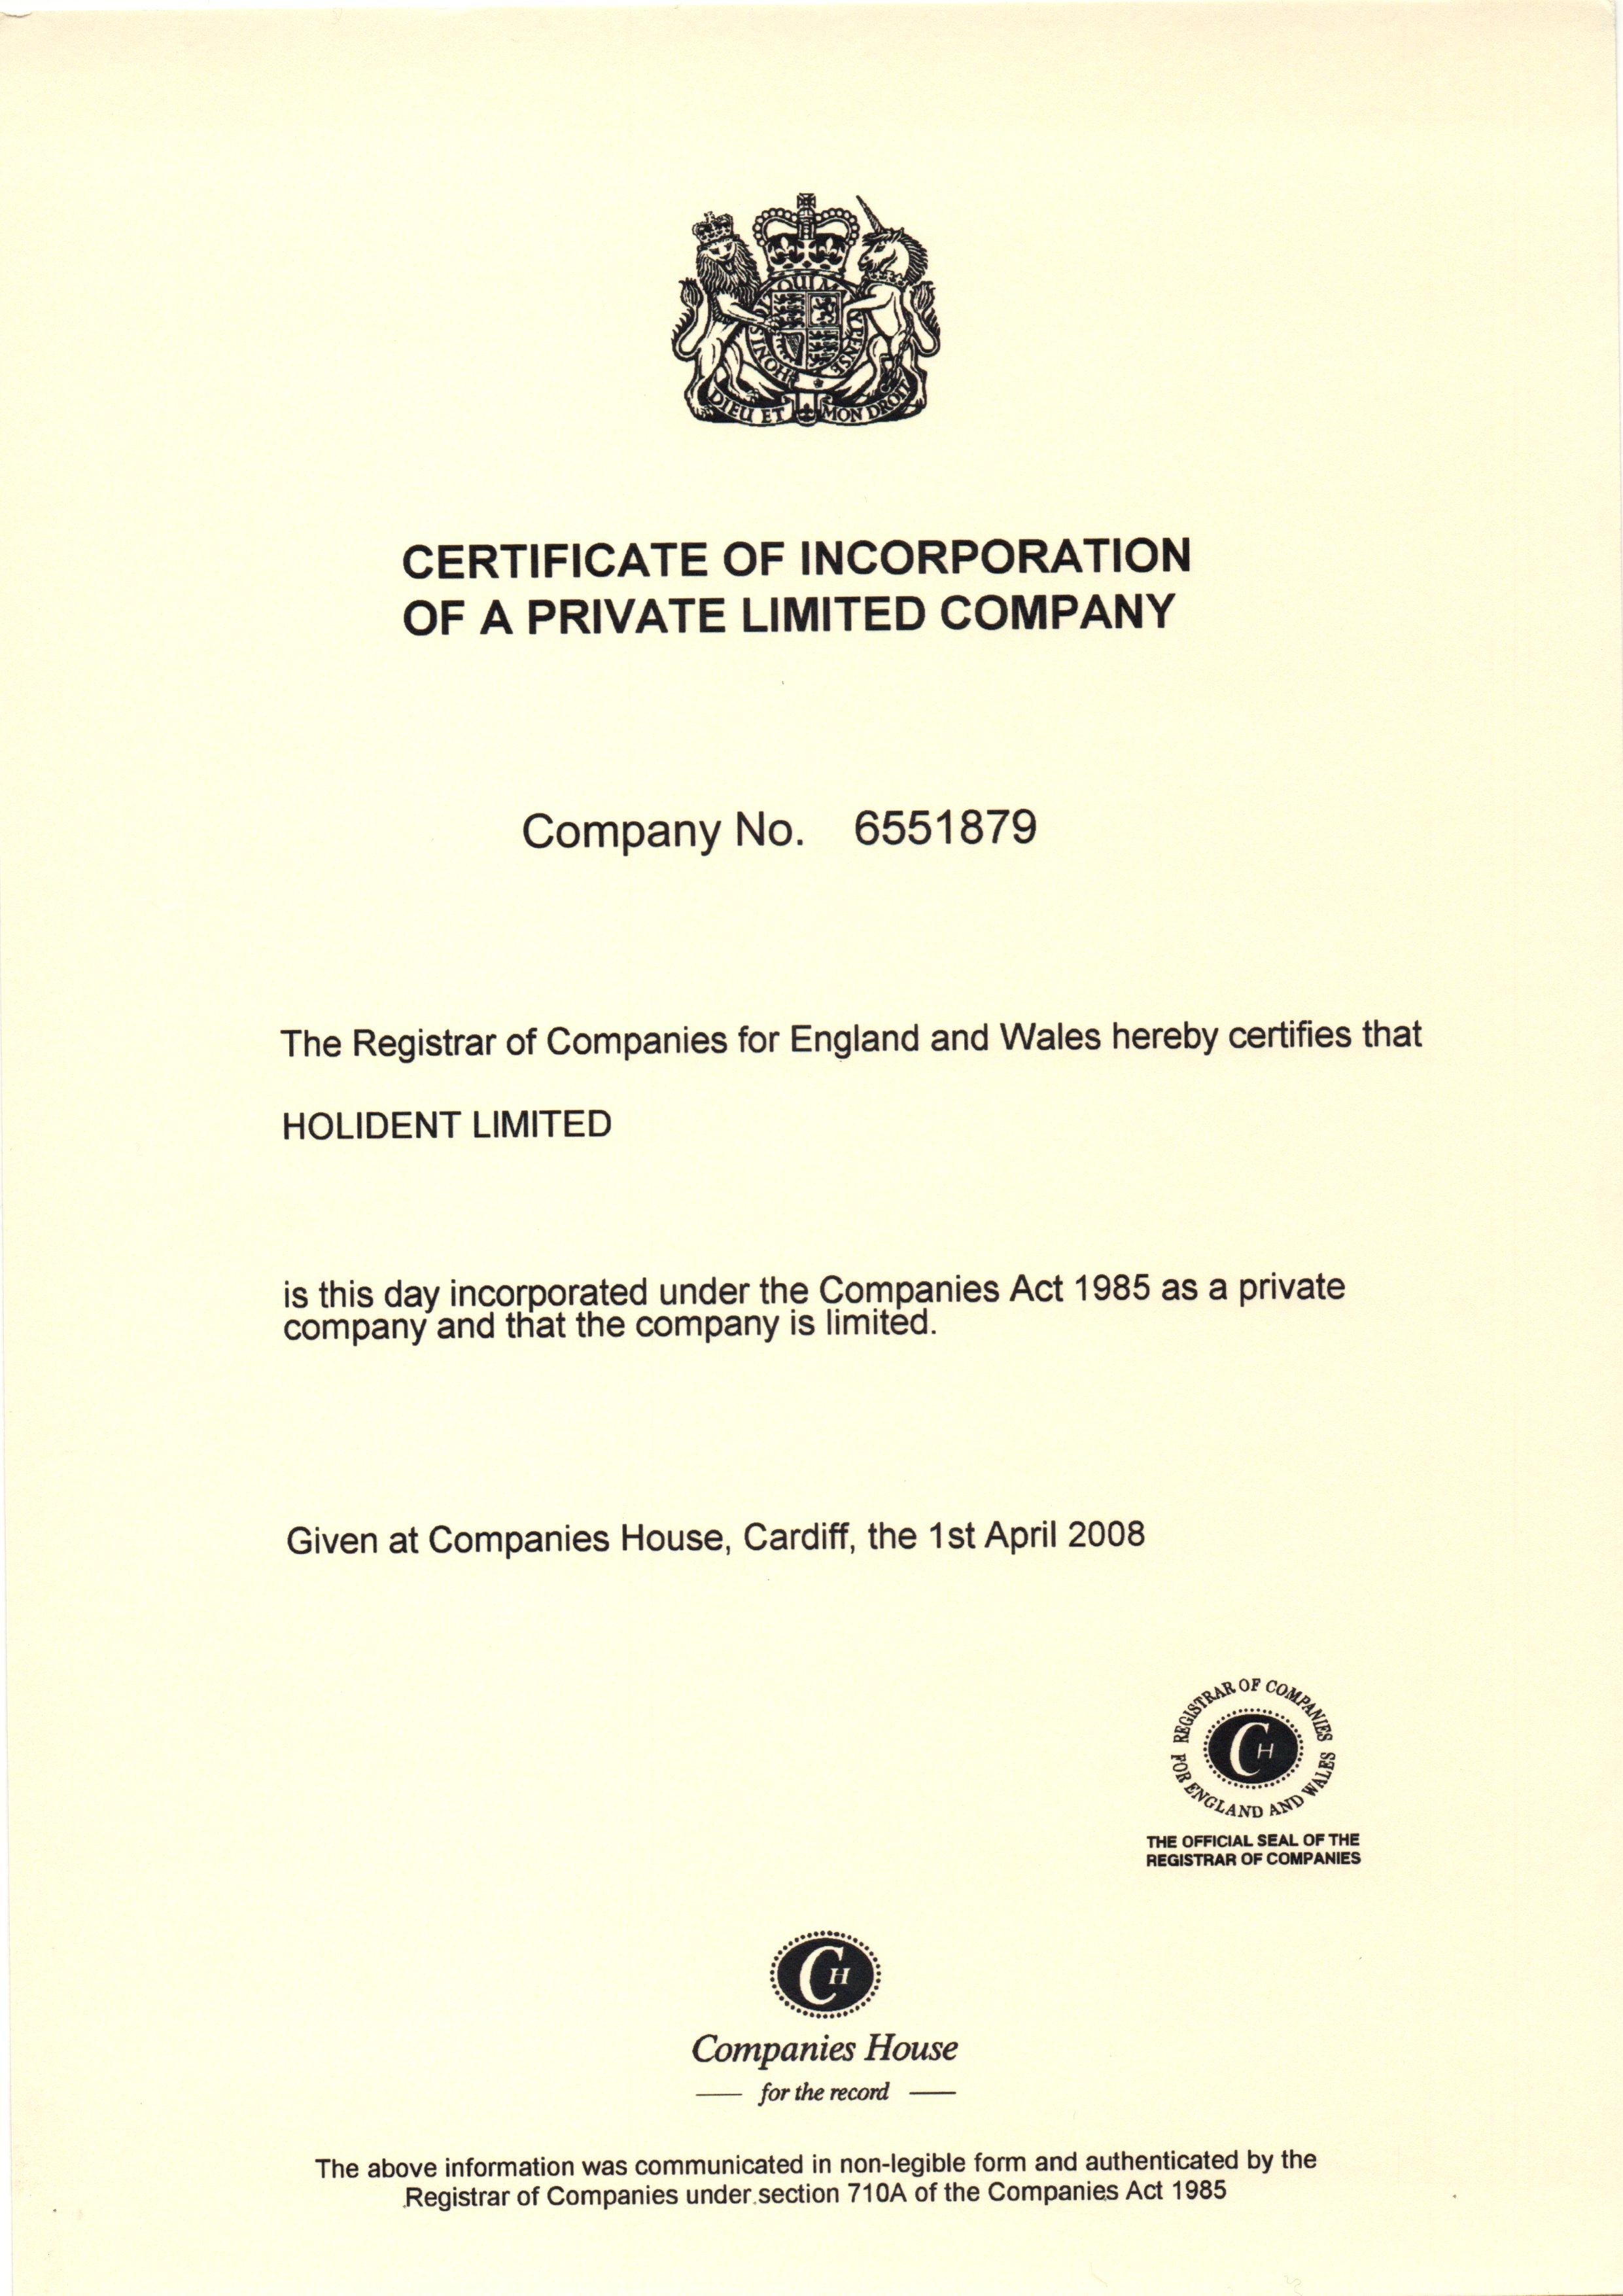 holident_ltd_company_house_deal_dr_elmar_jung.jpg